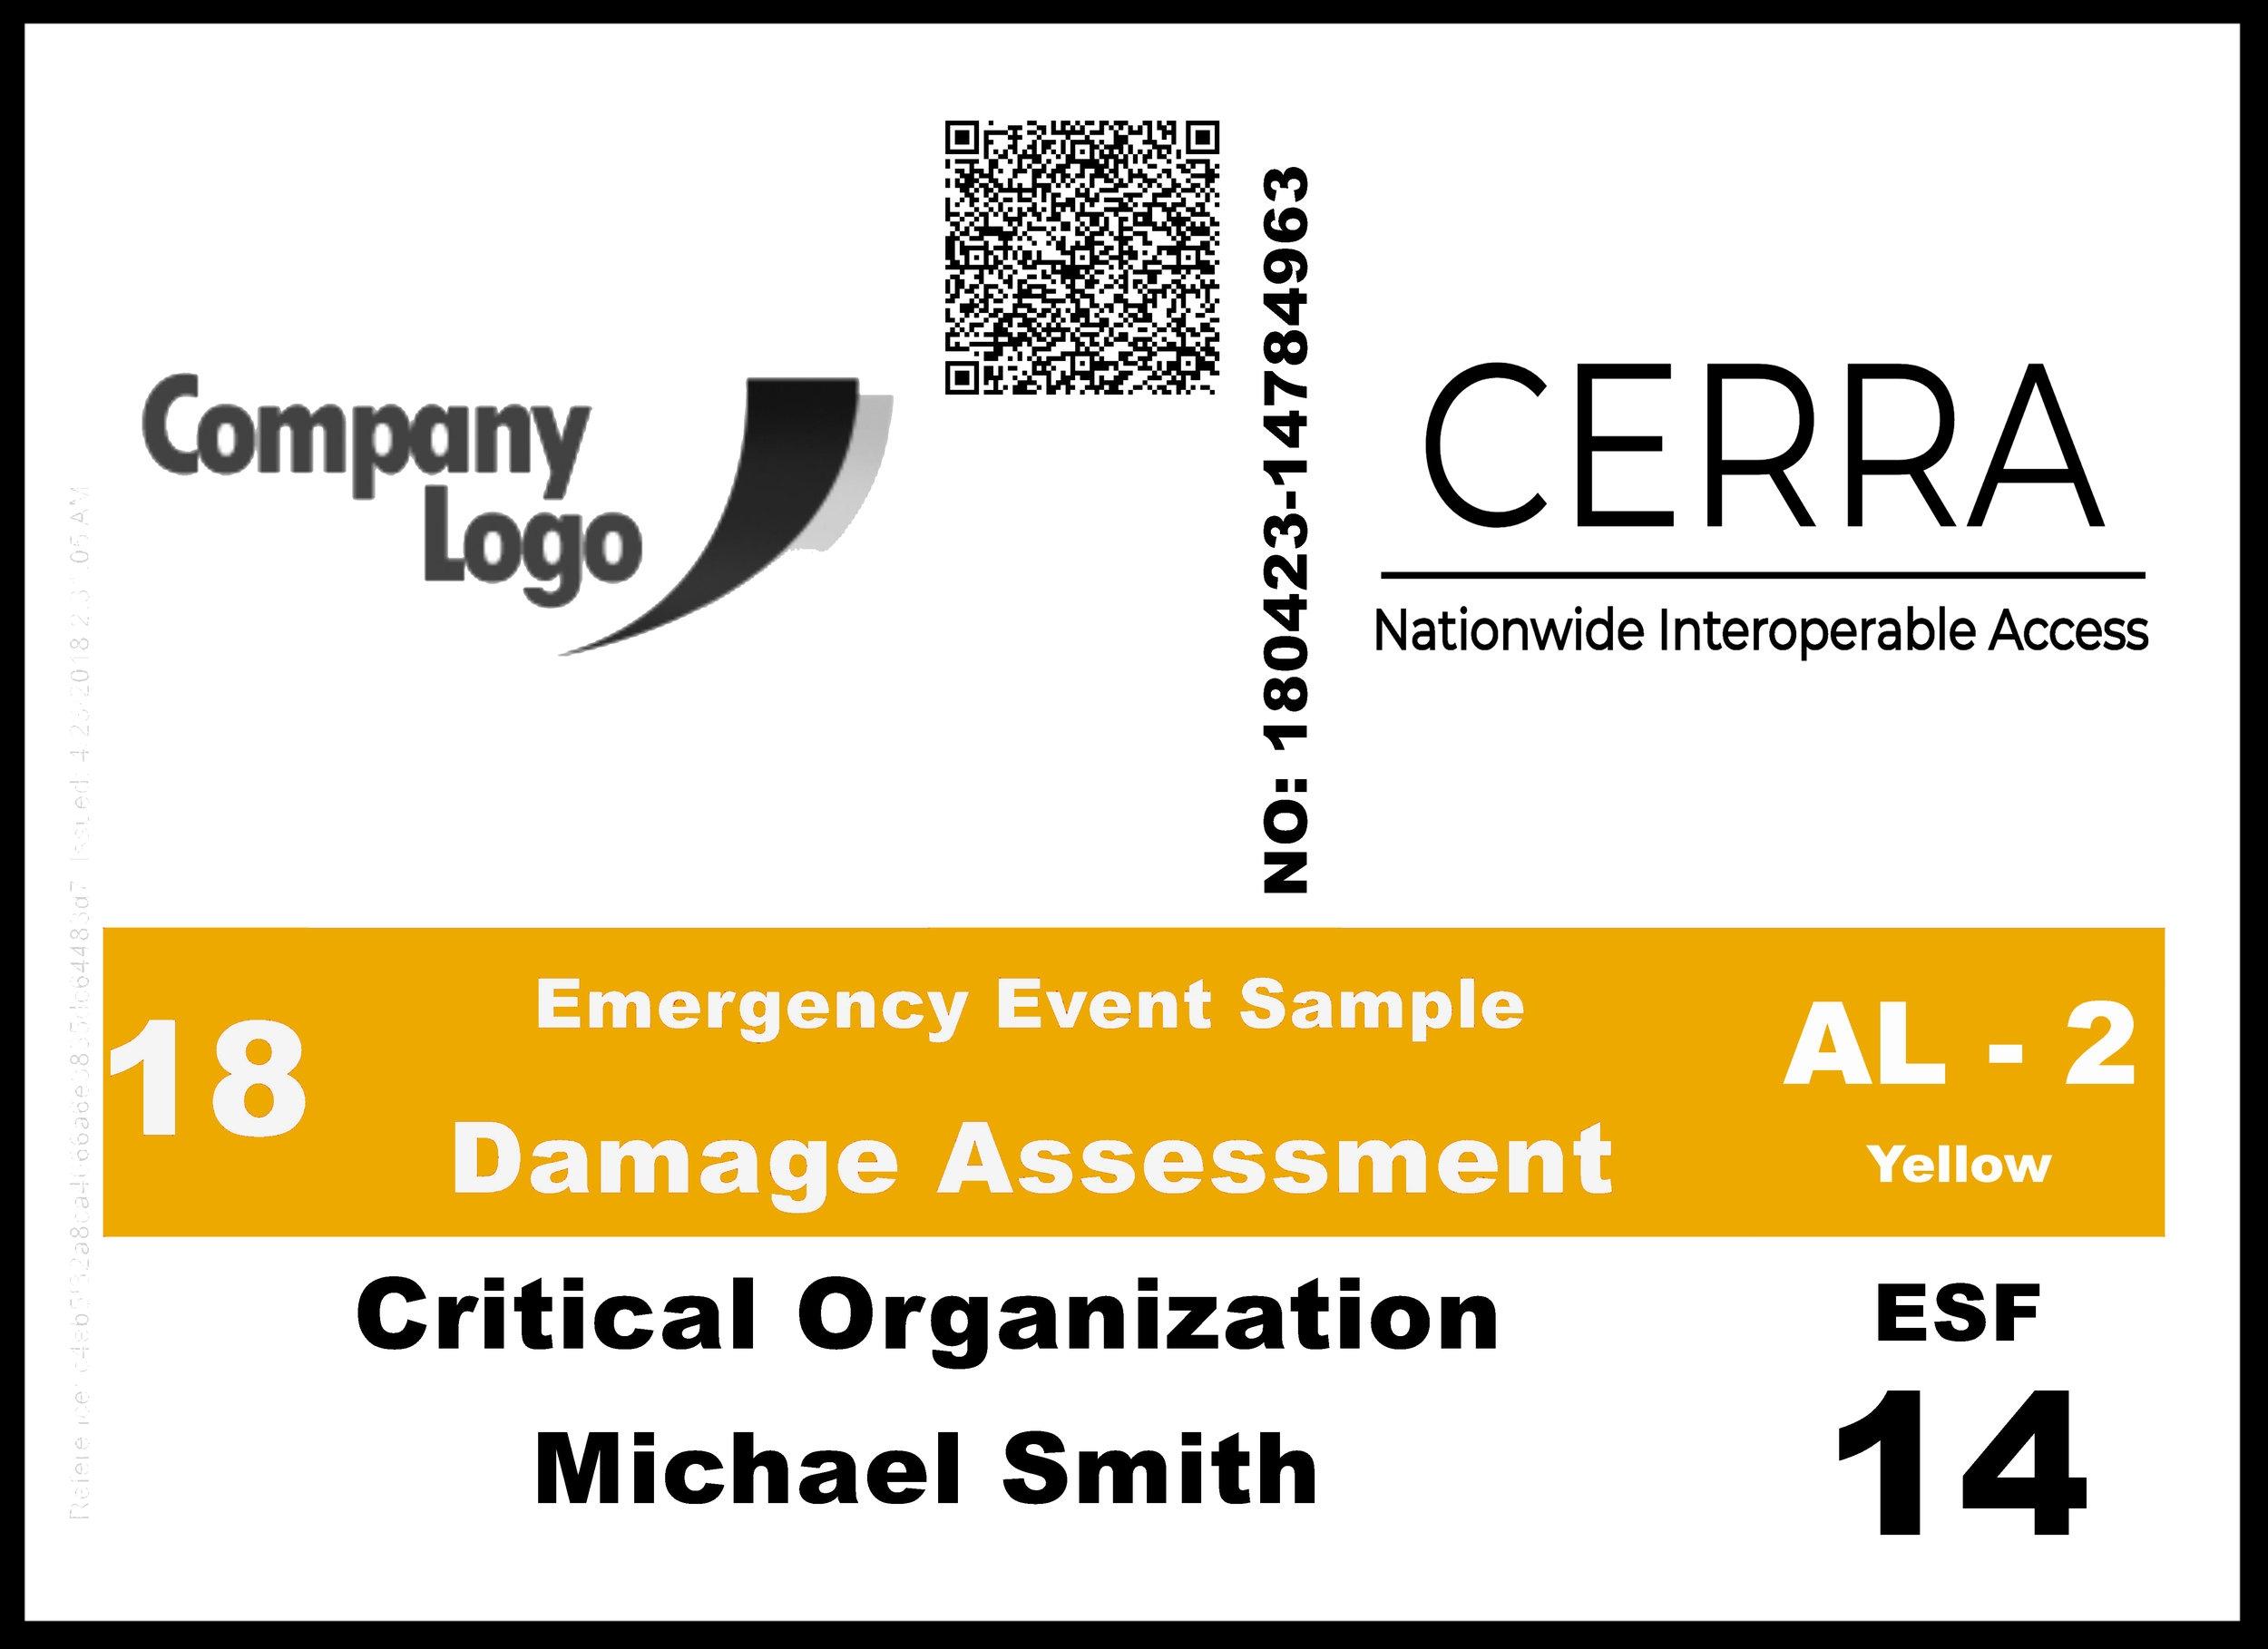 CERRA AL-2 Placard.jpg